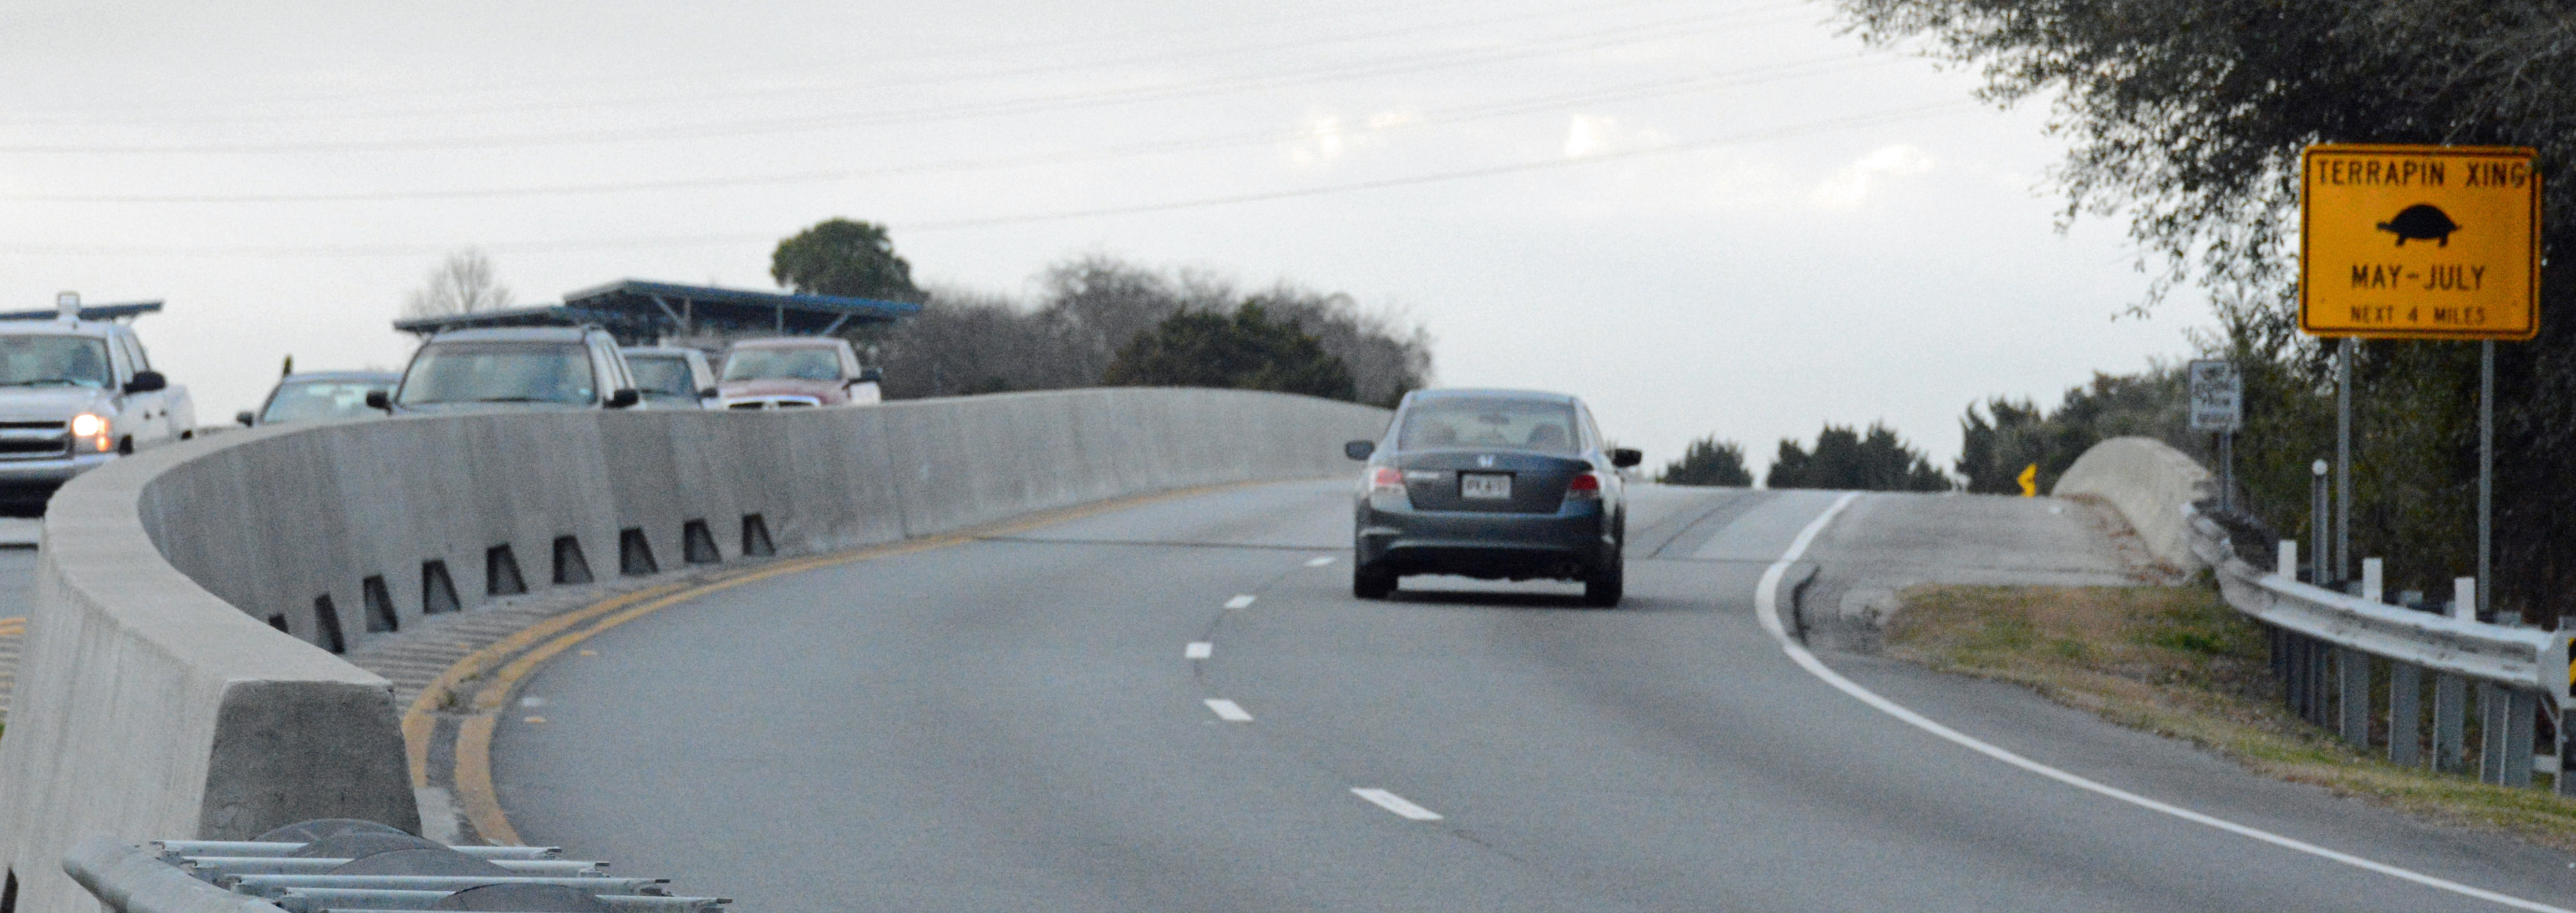 File:Terrapin Crossing, FJ Torras Causeway, St. Simons, Georgia.